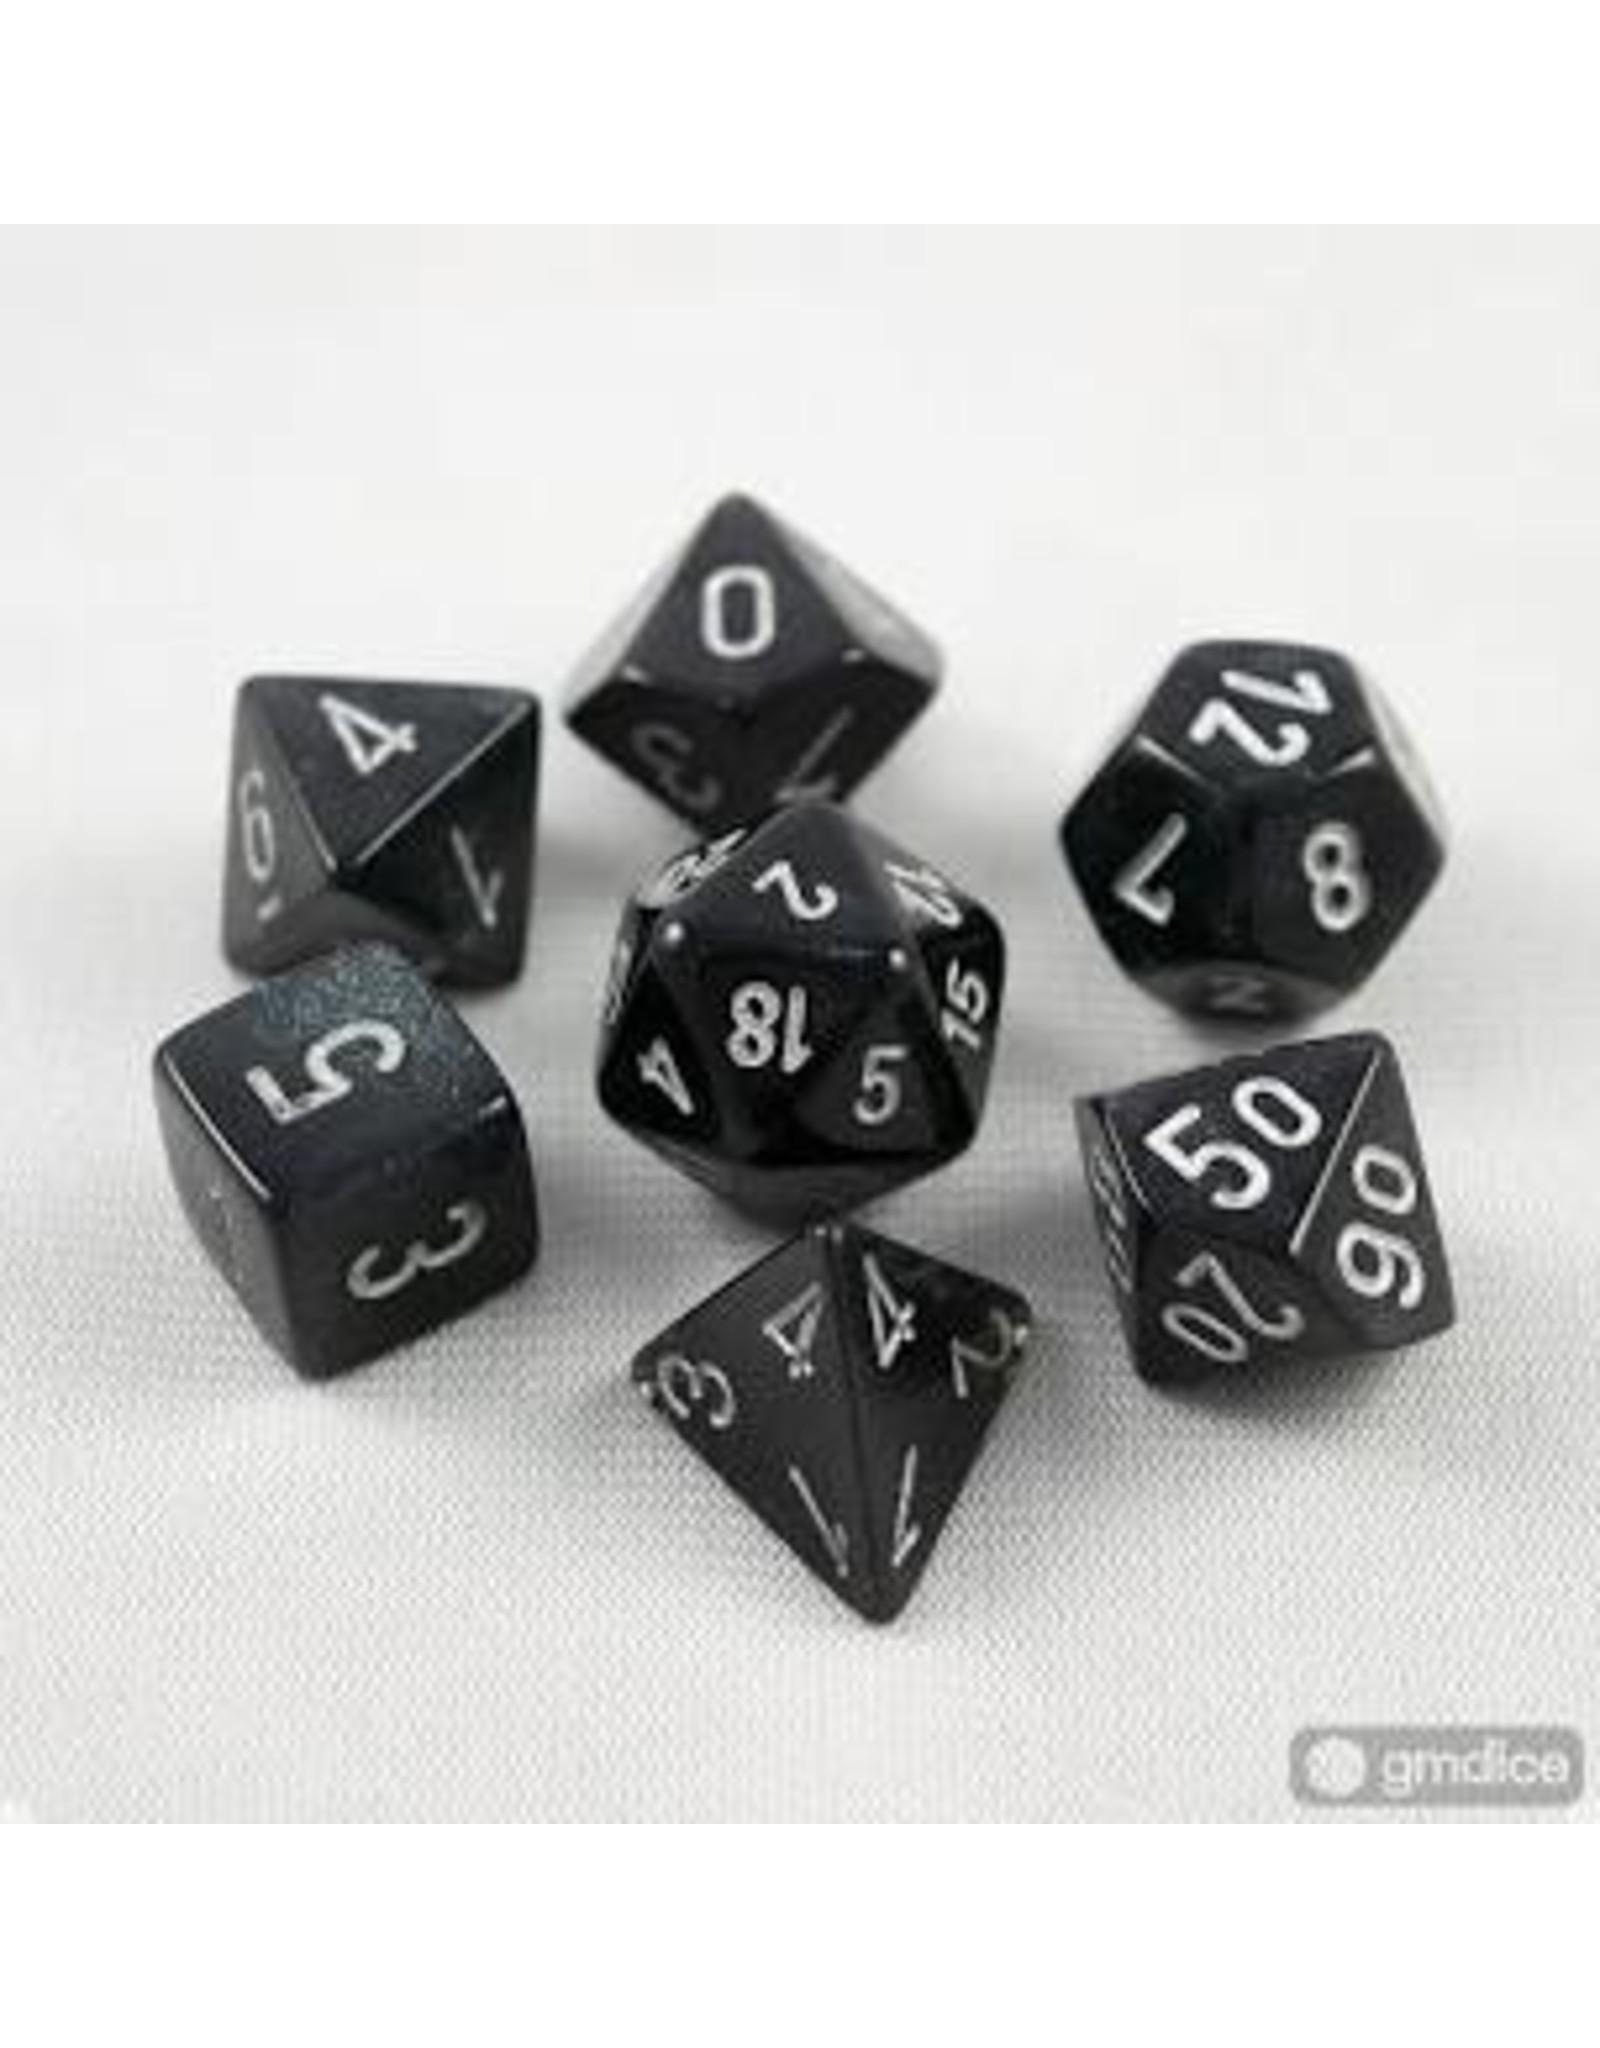 Chessex 7-Set Polyhedral CubeBOR#2 SMsv